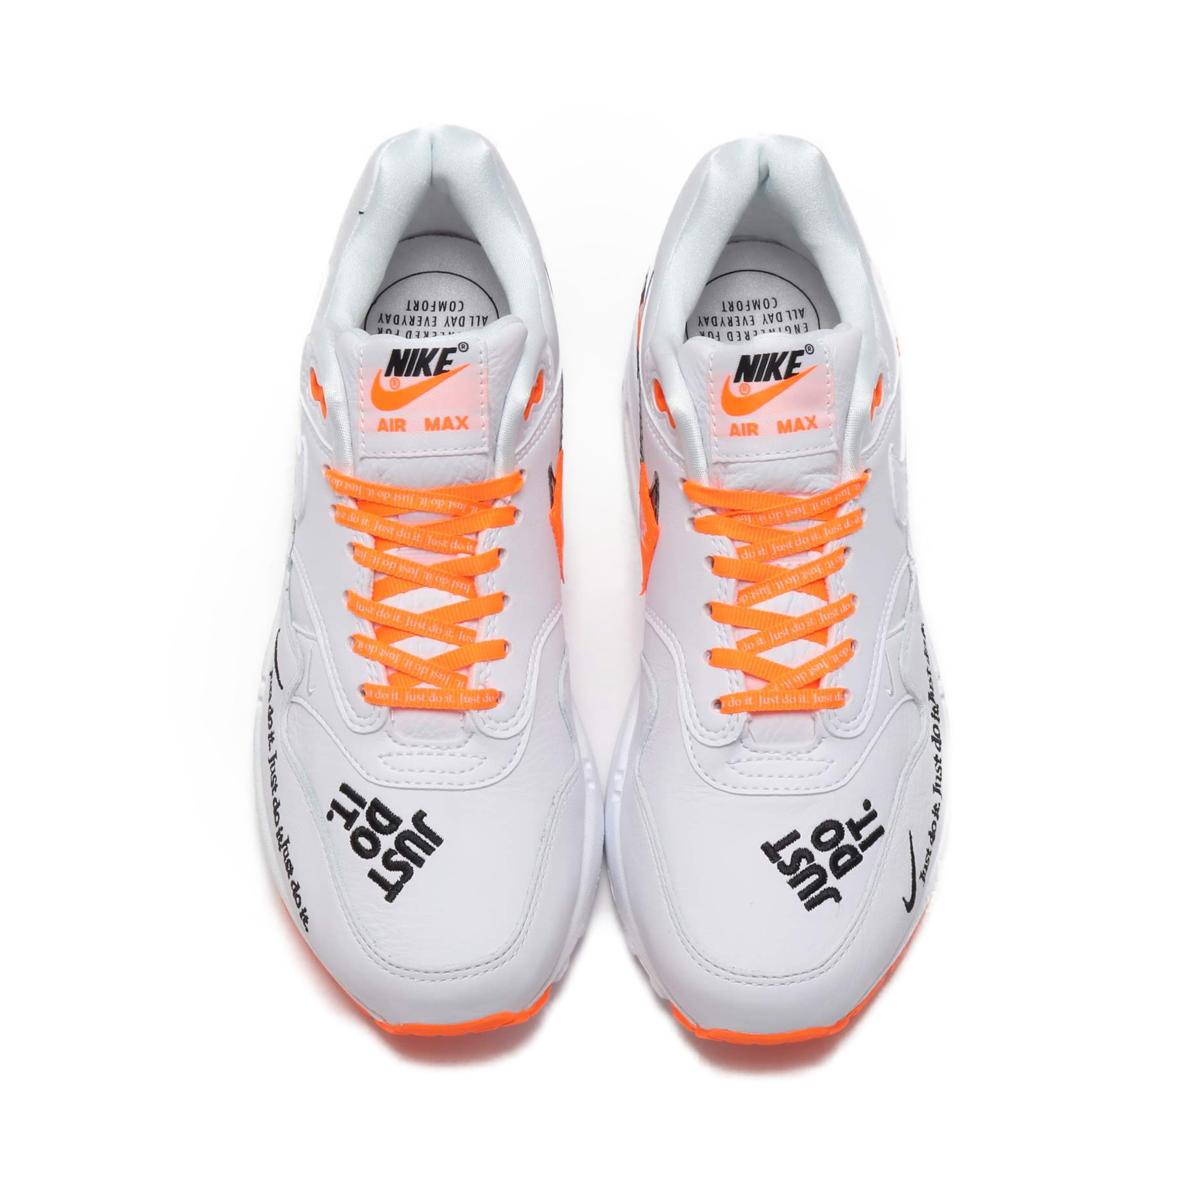 a3ec5047e20d top quality mens nike air max 1 orange spain e148a 041fb